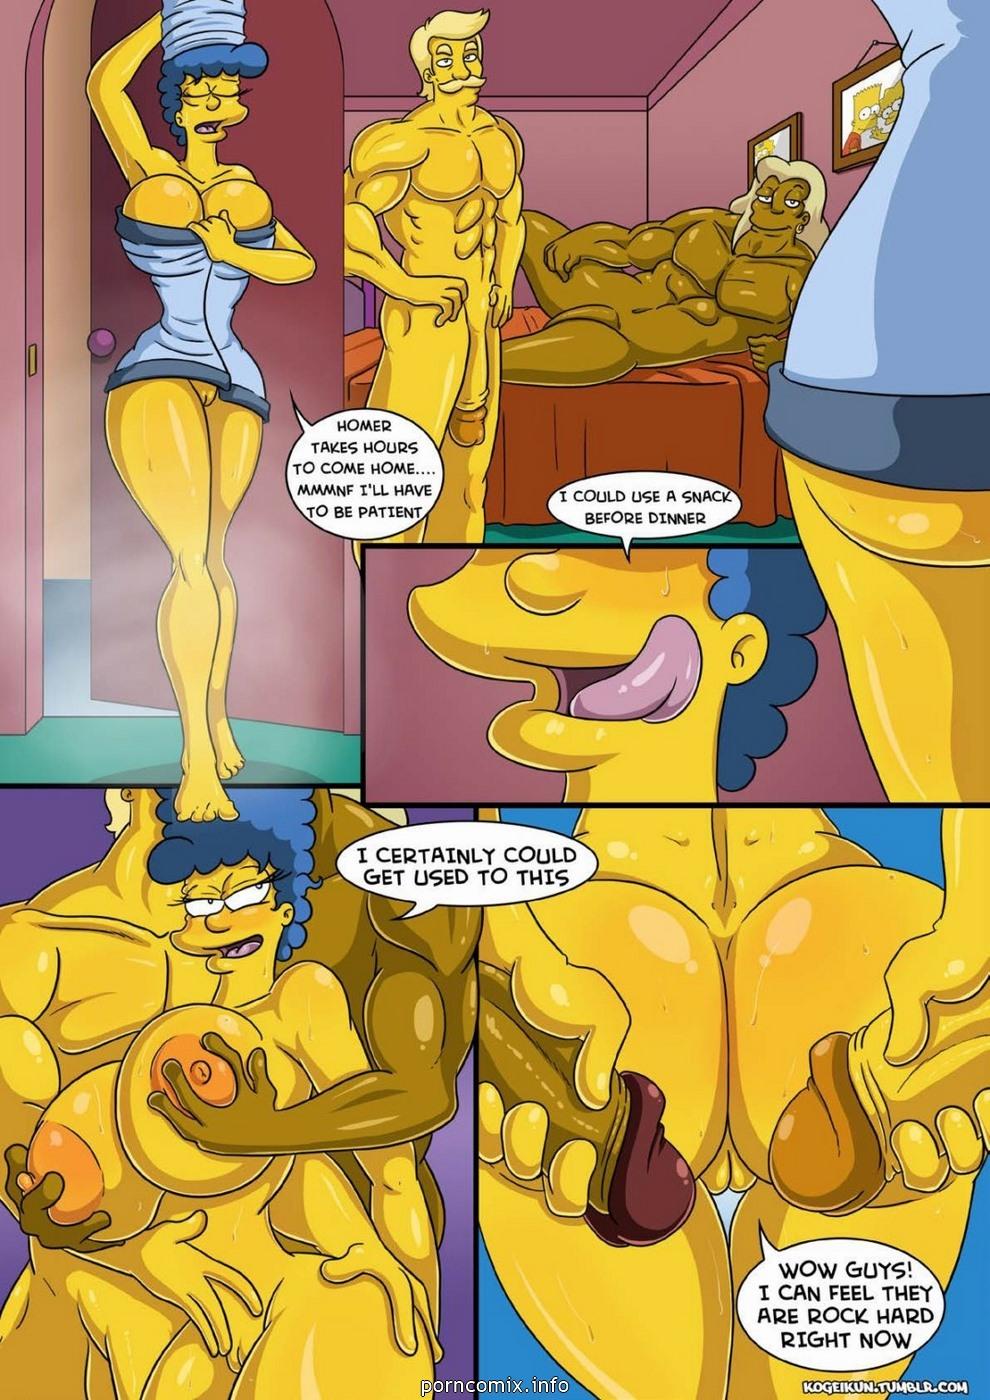 Very pity the simpson porn apologise